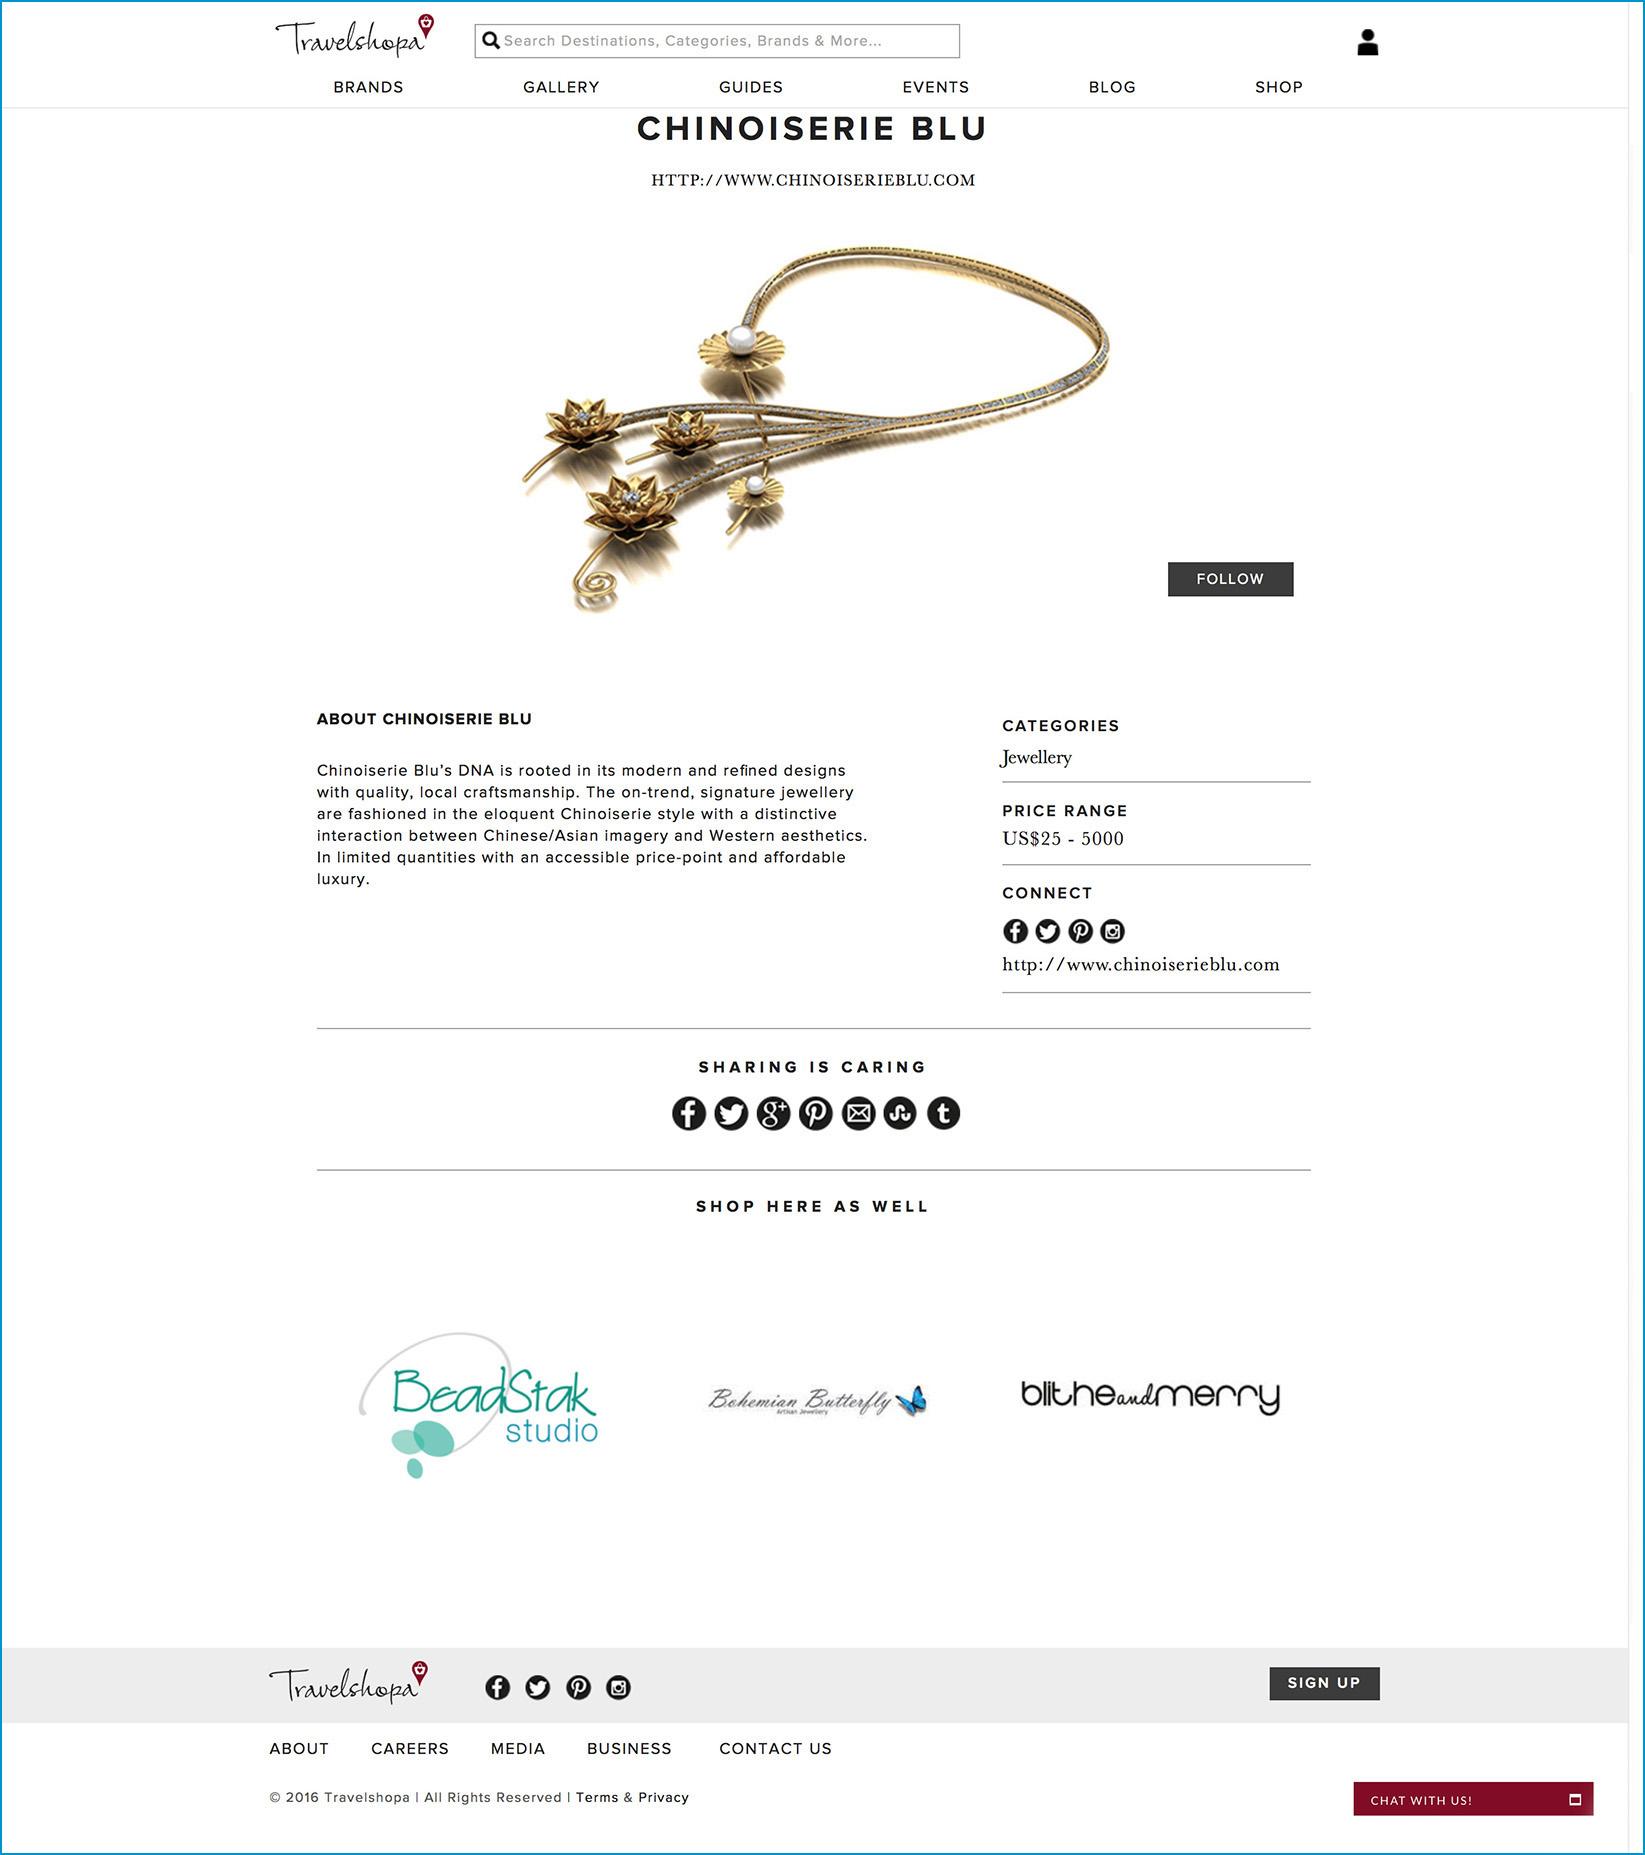 2016.12.01 Chinoiserie Blu travelshopa.com Media Coverage